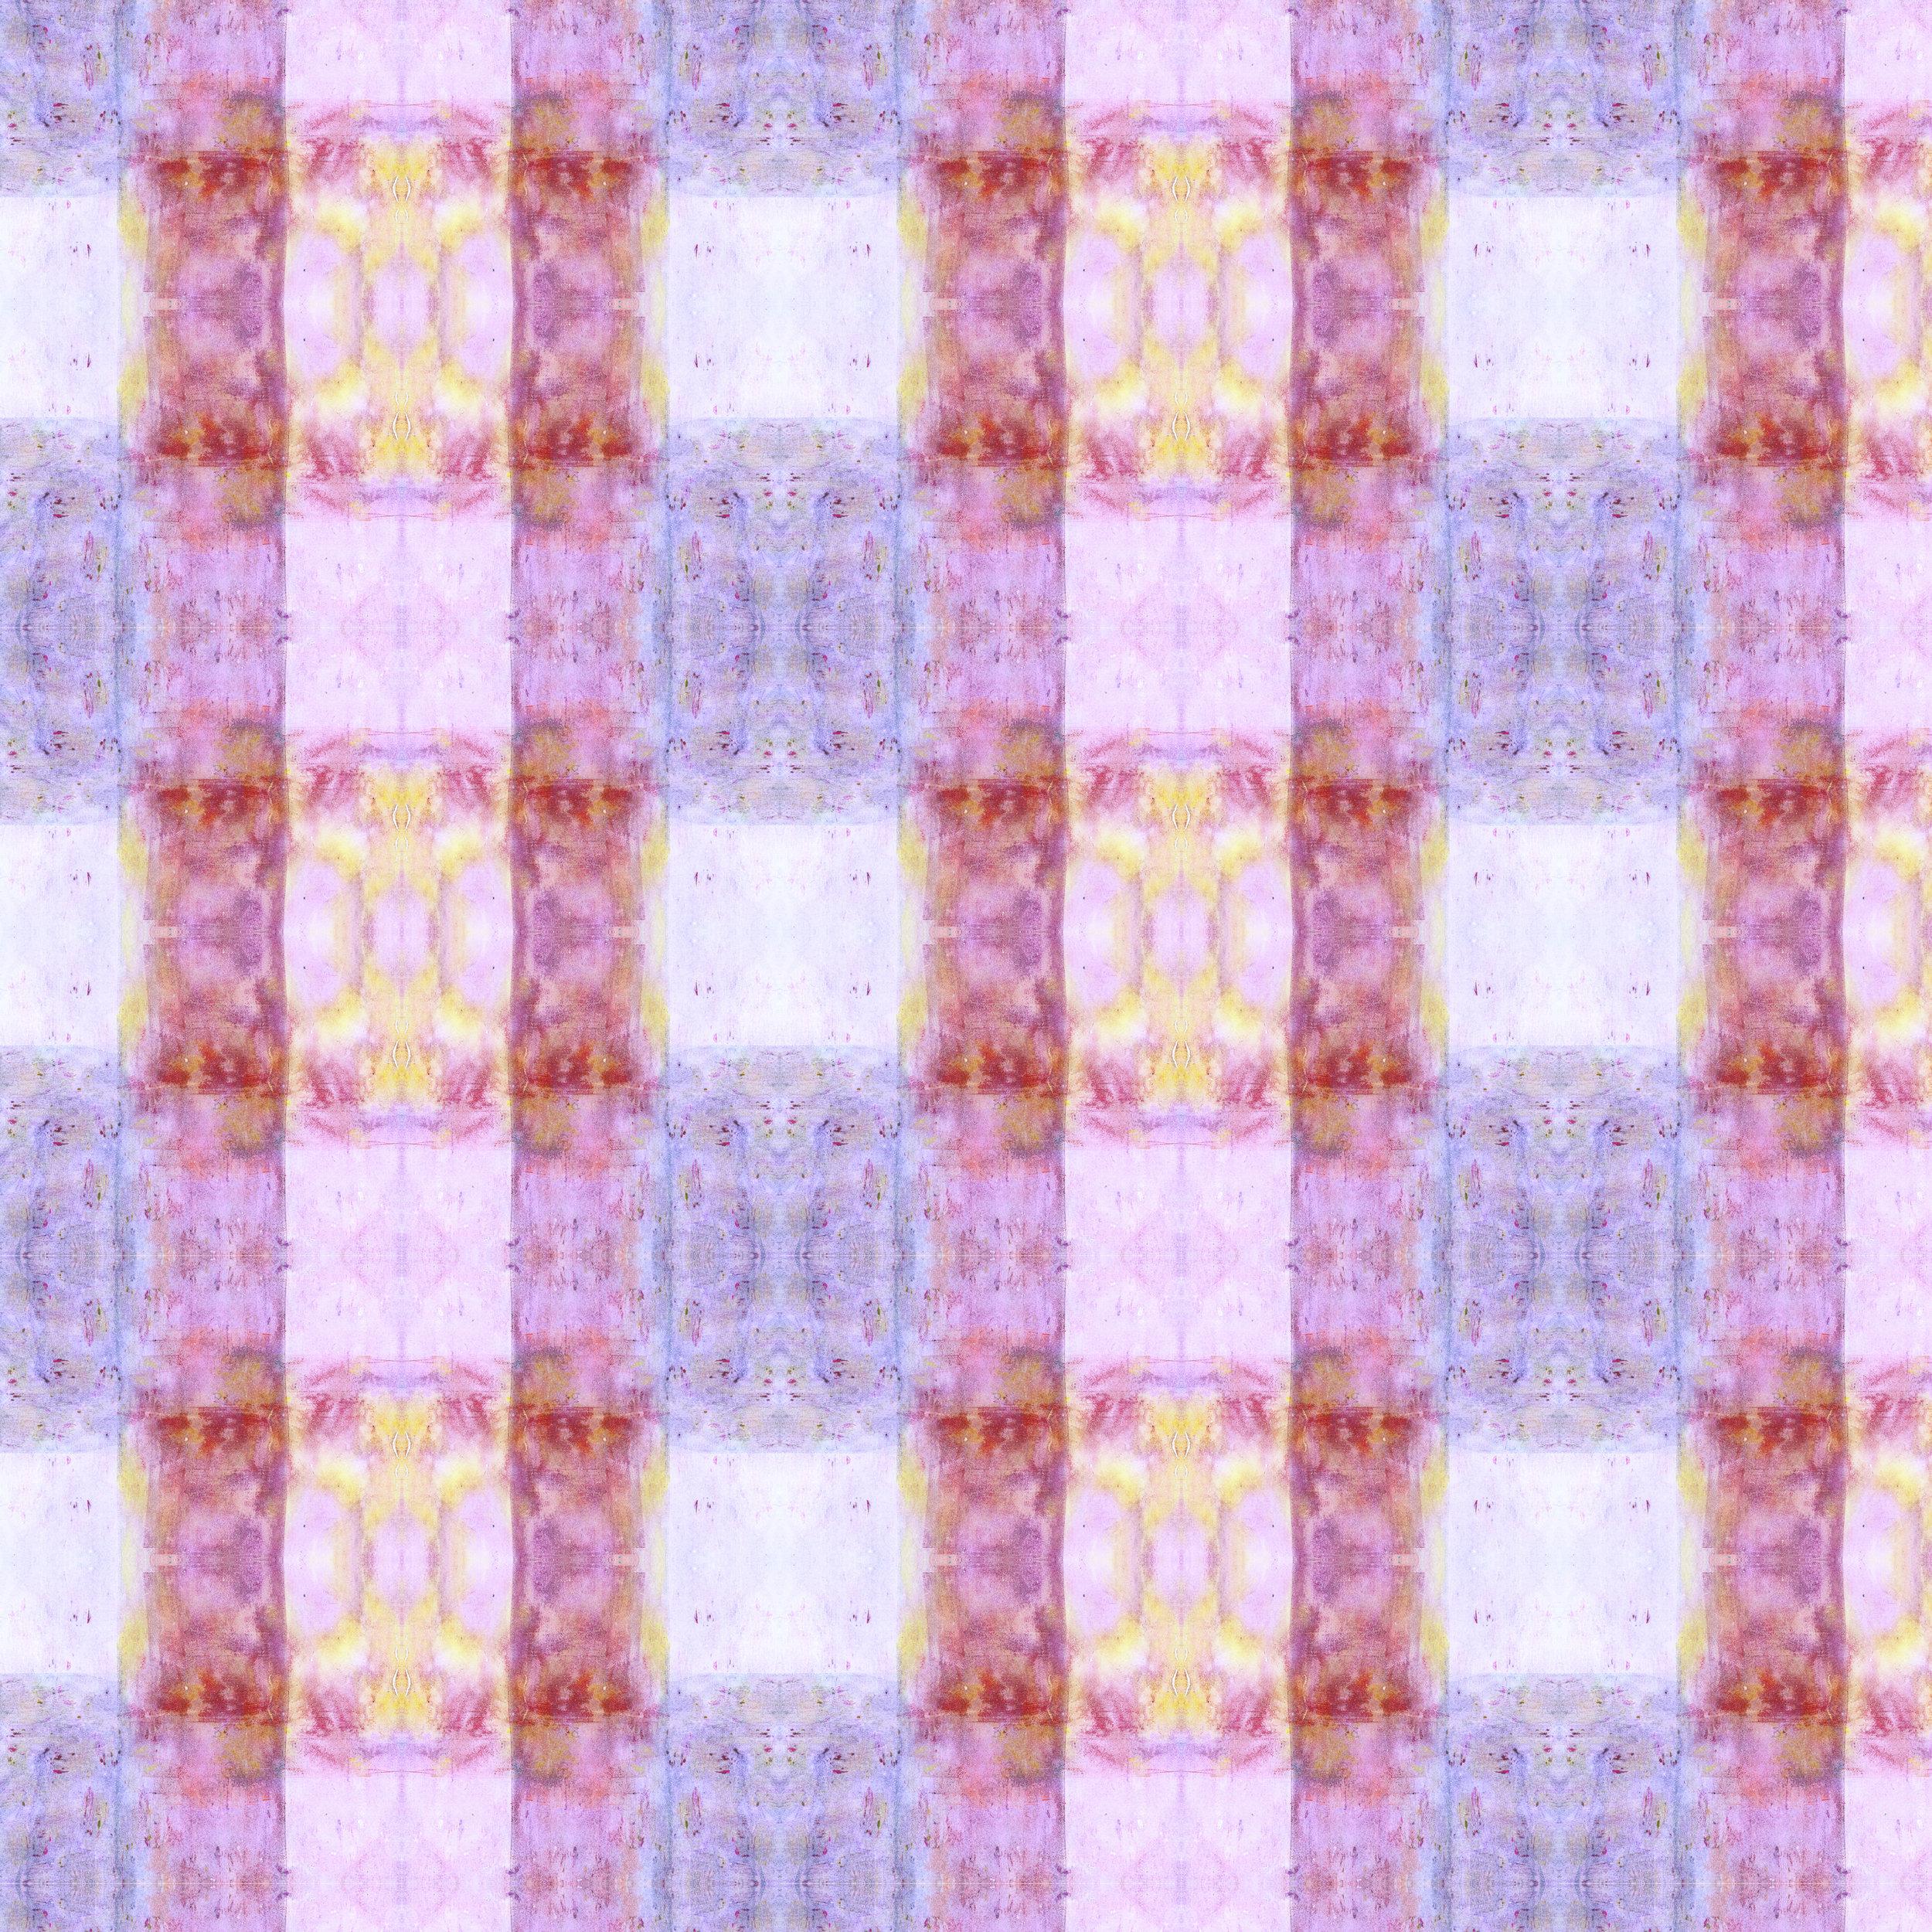 pattern_2.jpg